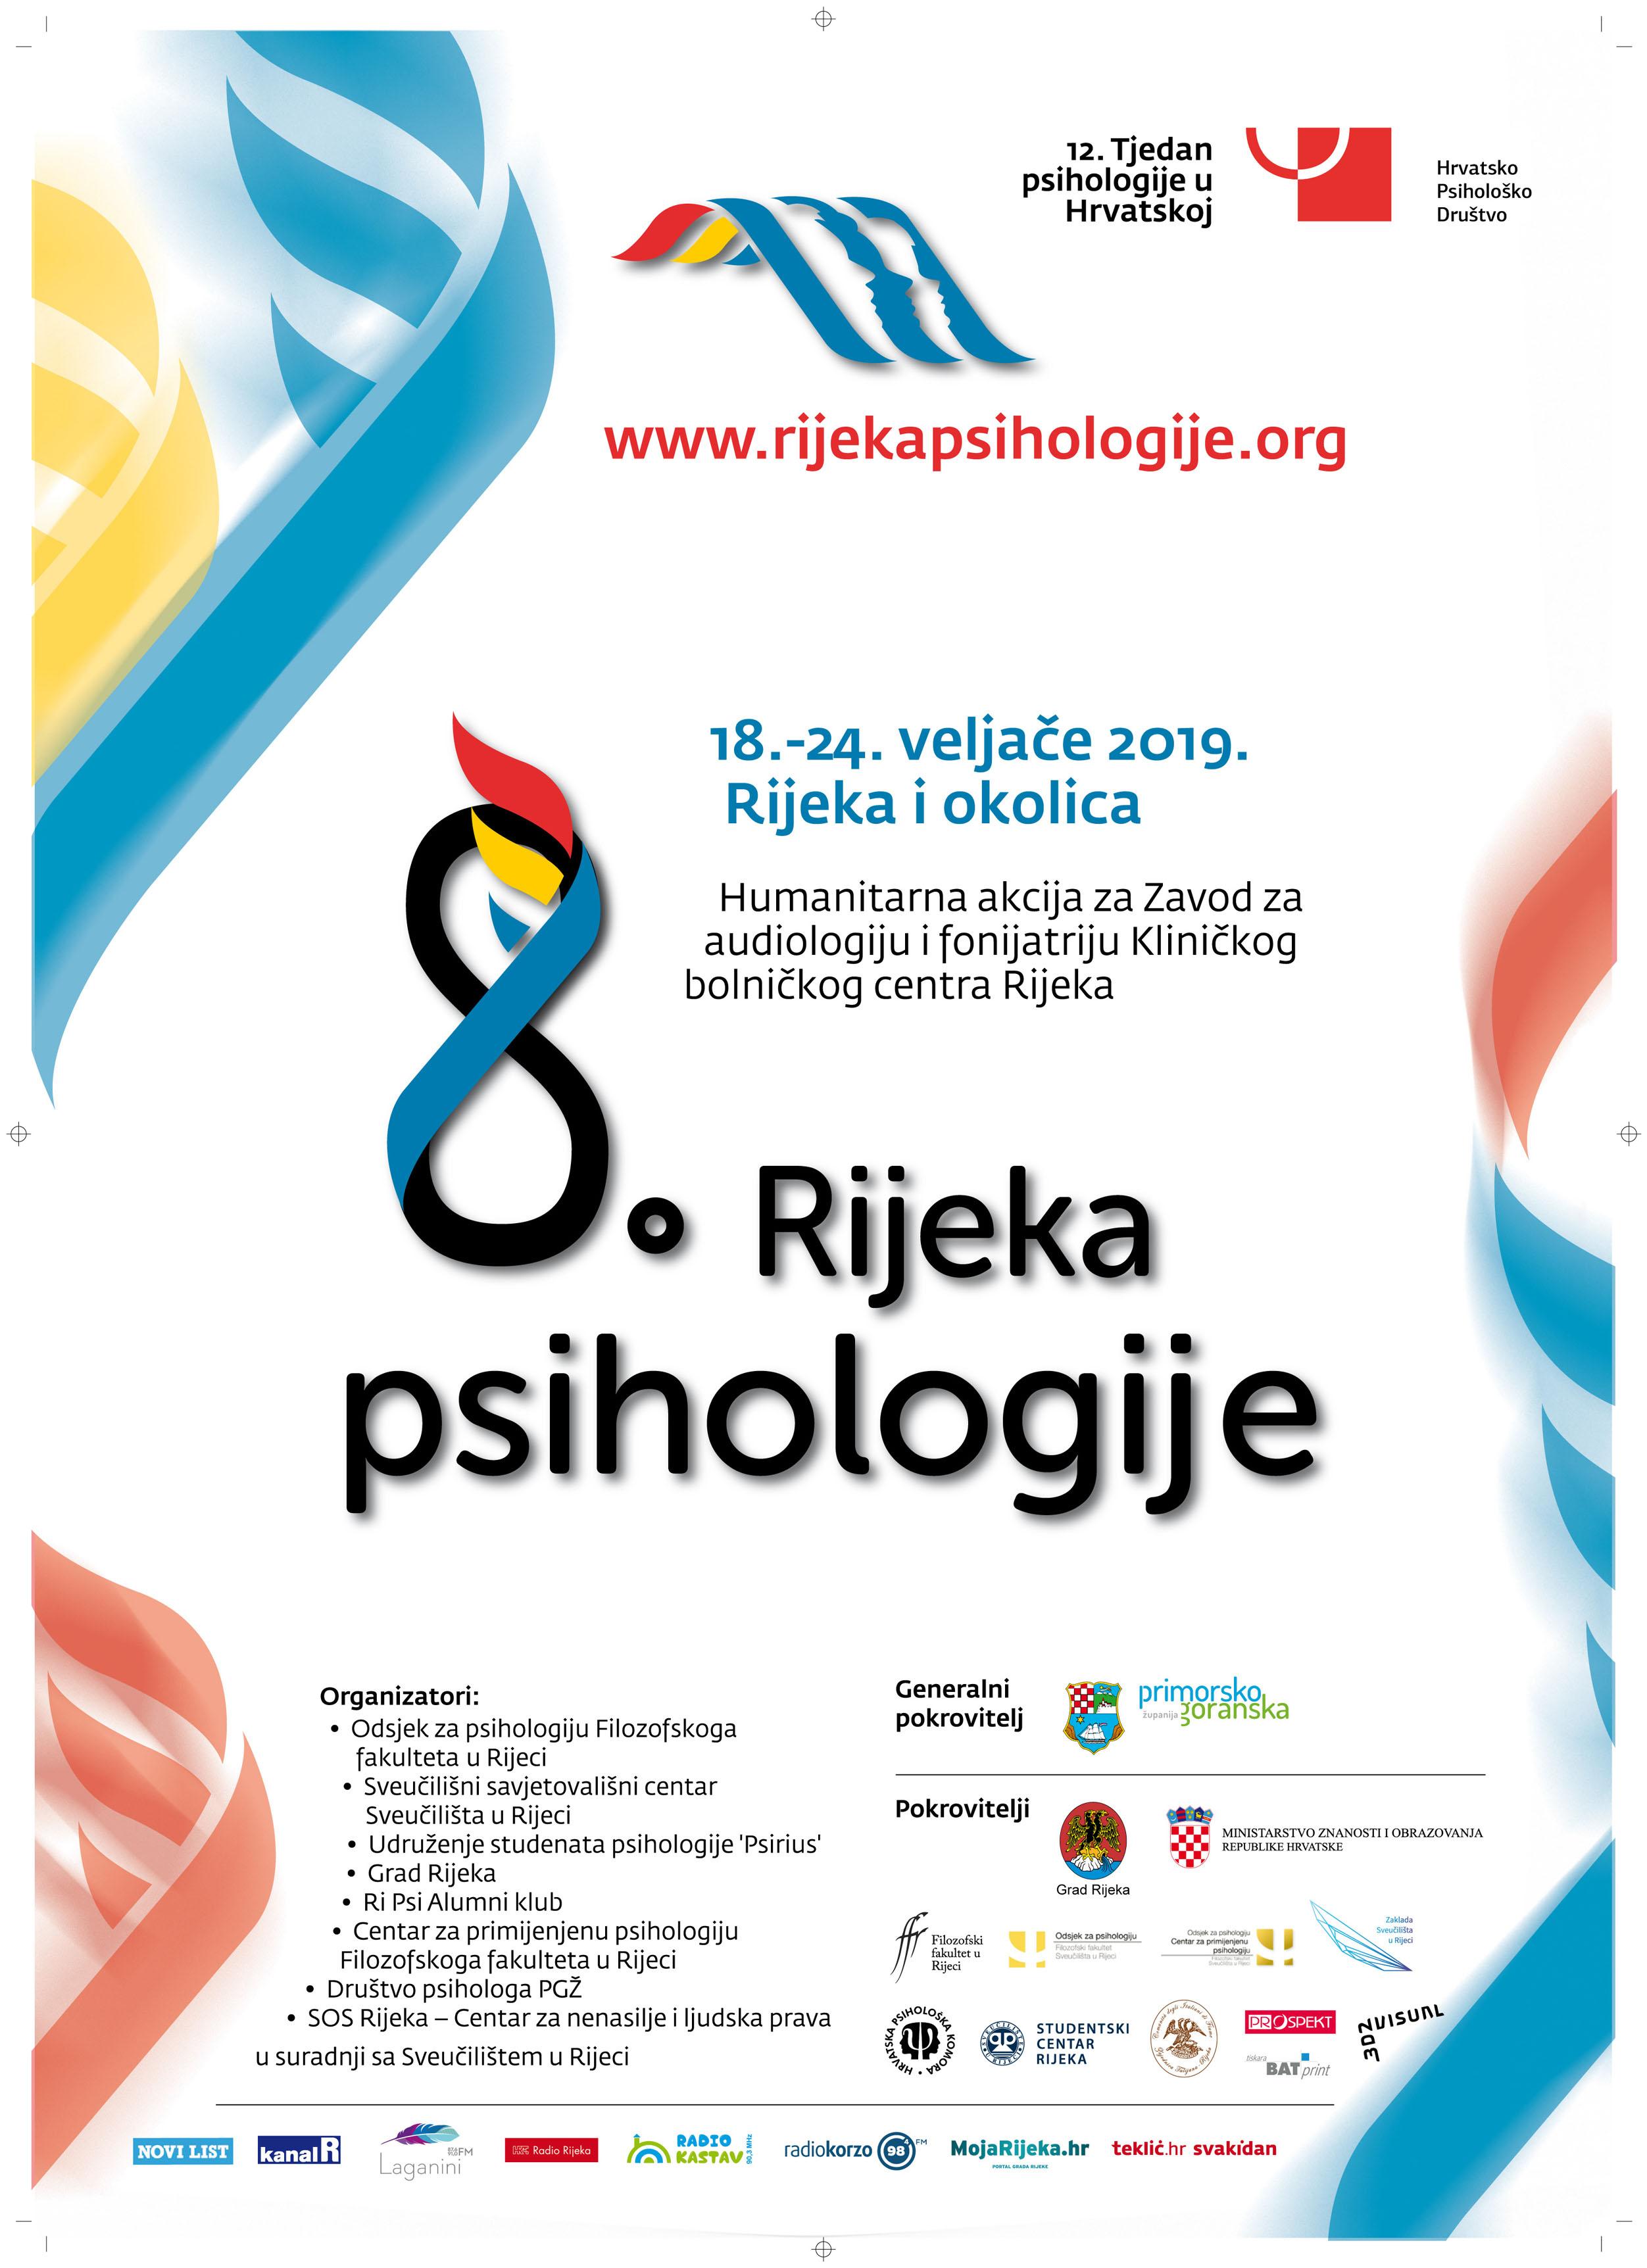 rijekapsihologije2019-plakatfinal-1548158445.jpg